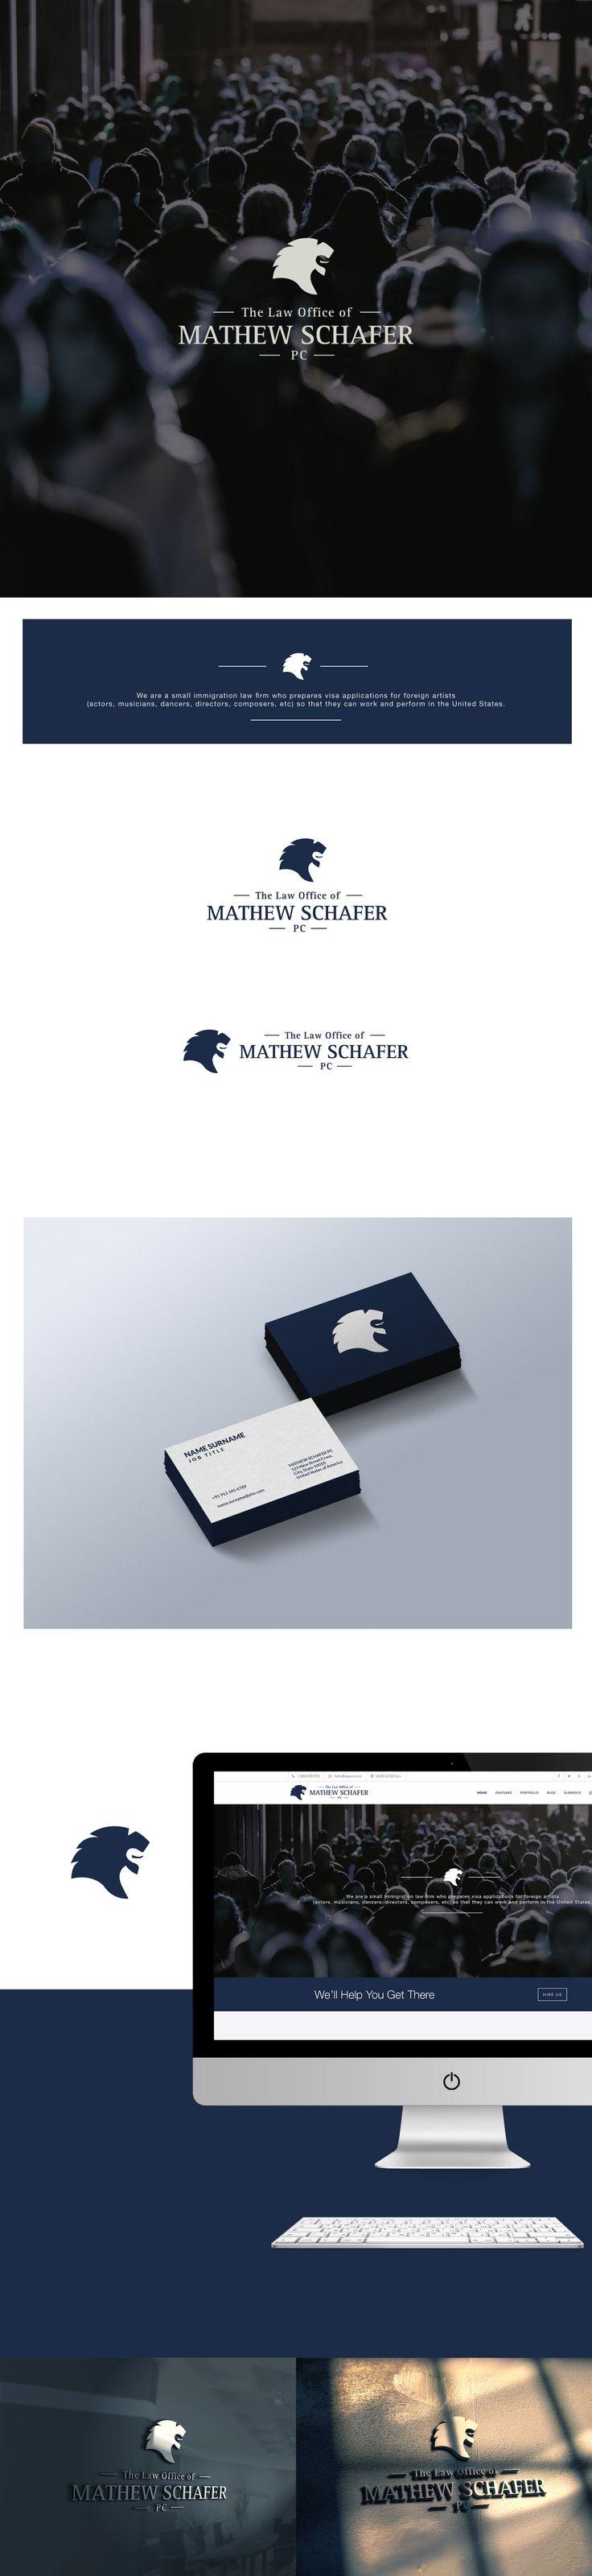 Financial, Insurance logo design proposal.